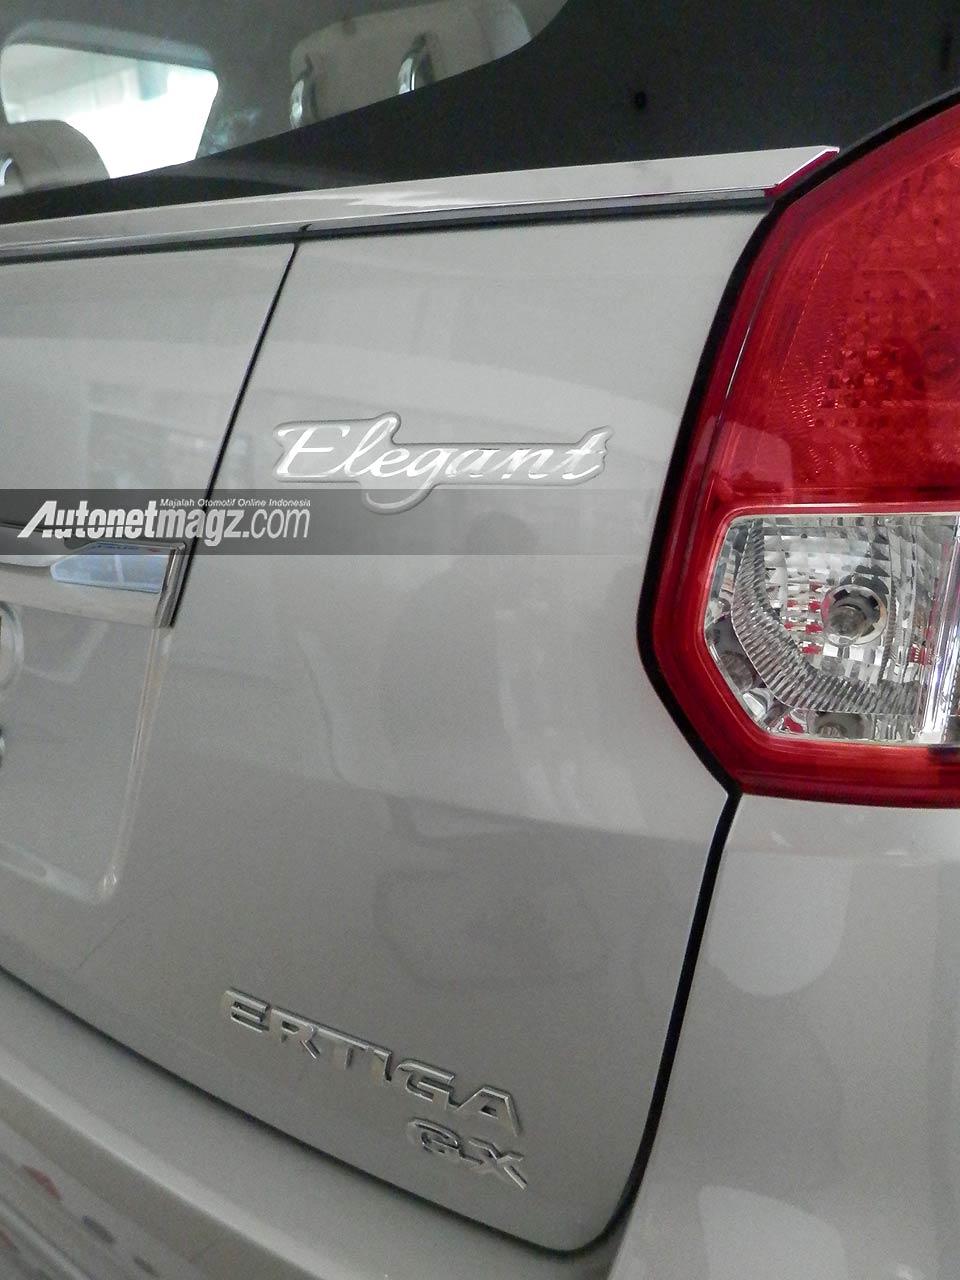 IIMS 2013, Suzuki Ertiga Elegant 2013 emblem: Suzuki Ertiga Elegant Tampil Lebih Mewah [with Video]